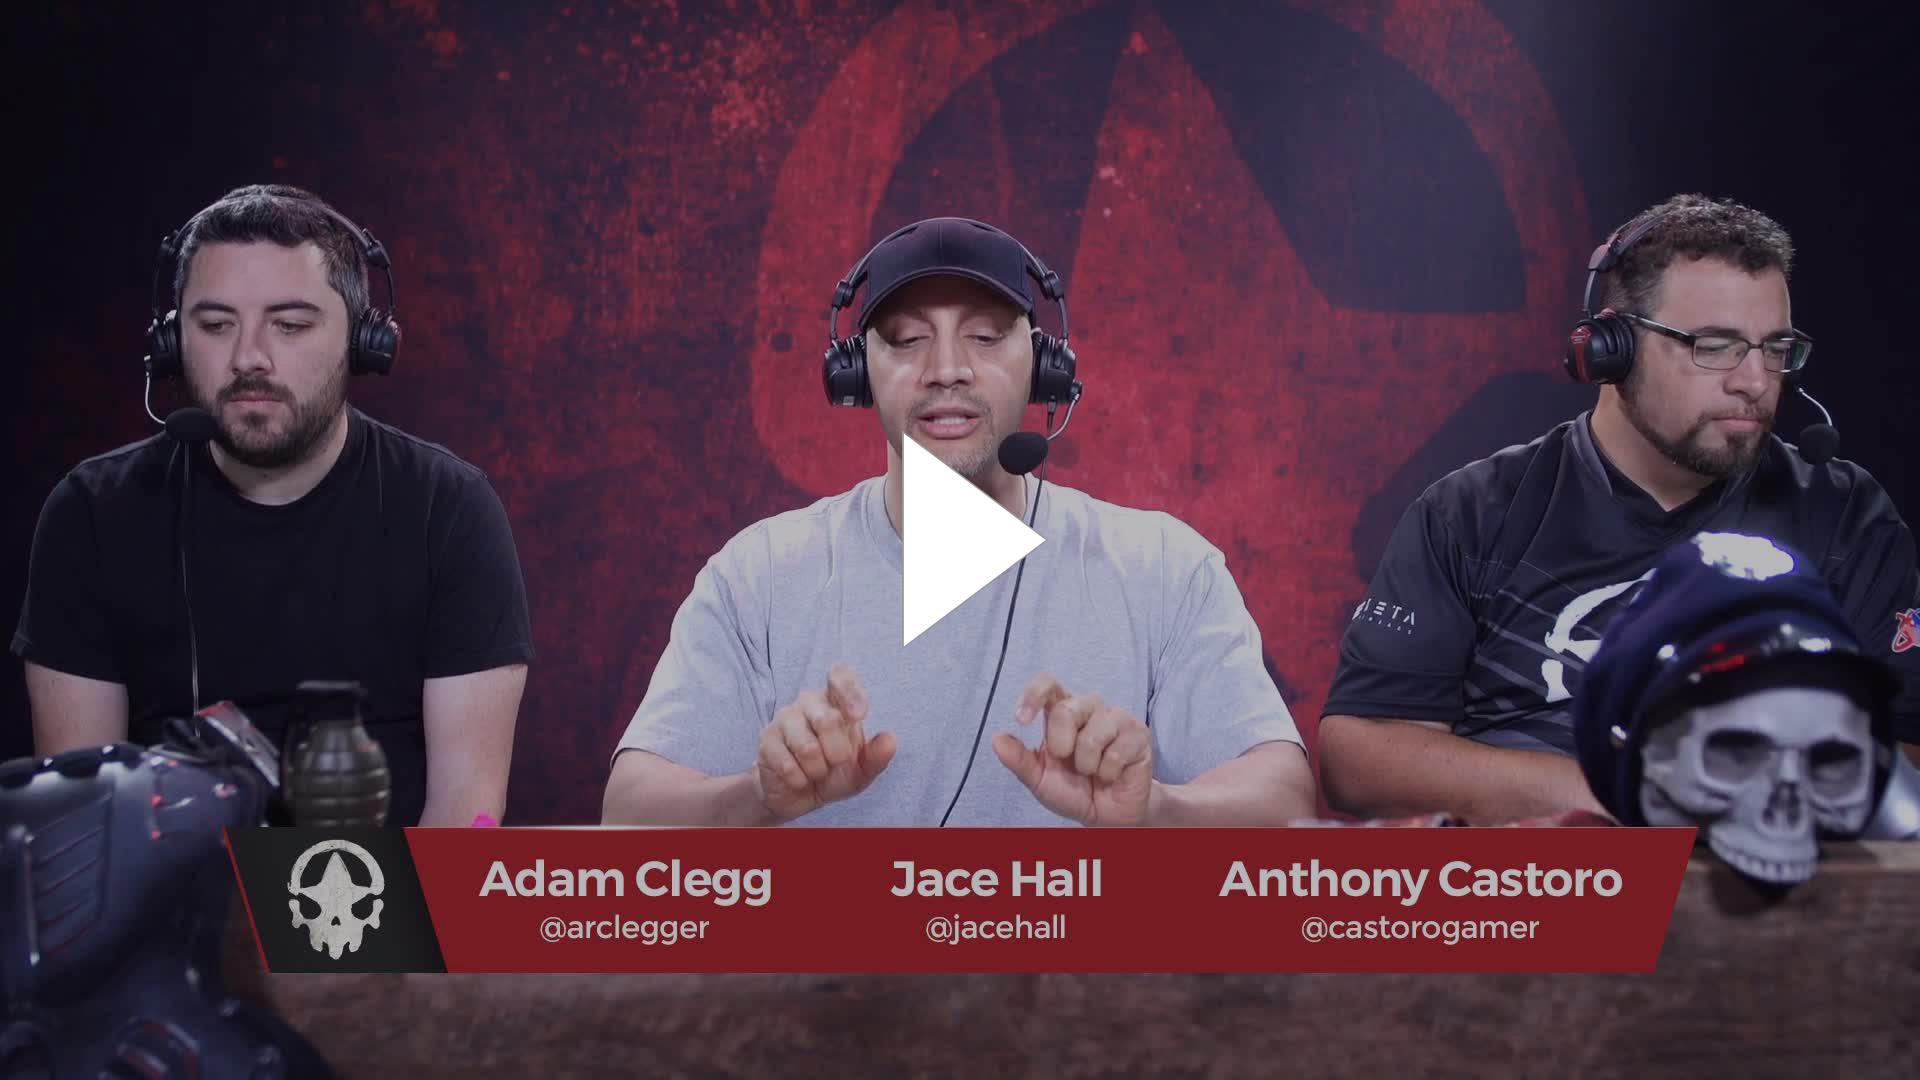 Z1BattleRoyale - Jace Hall explains the lack of payments to